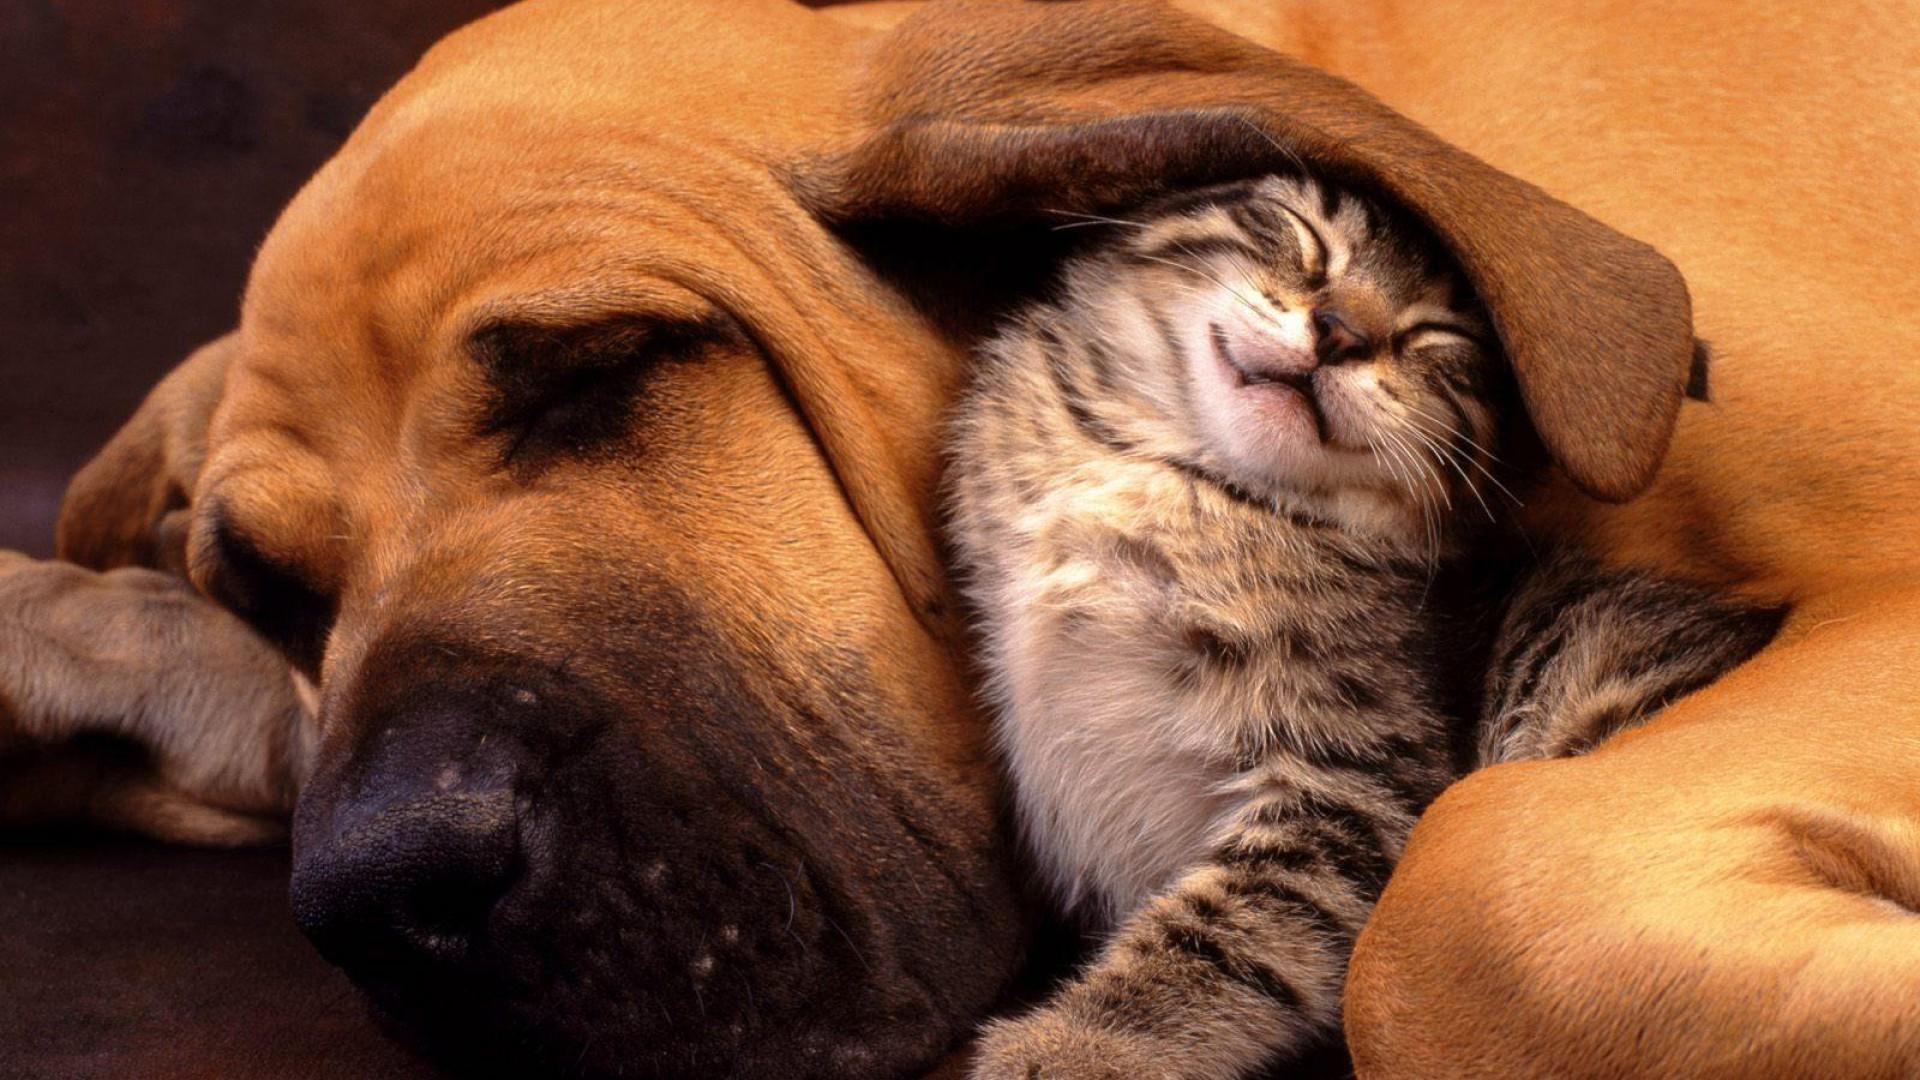 Nature Dog Hounds Friendship Kittens Cat